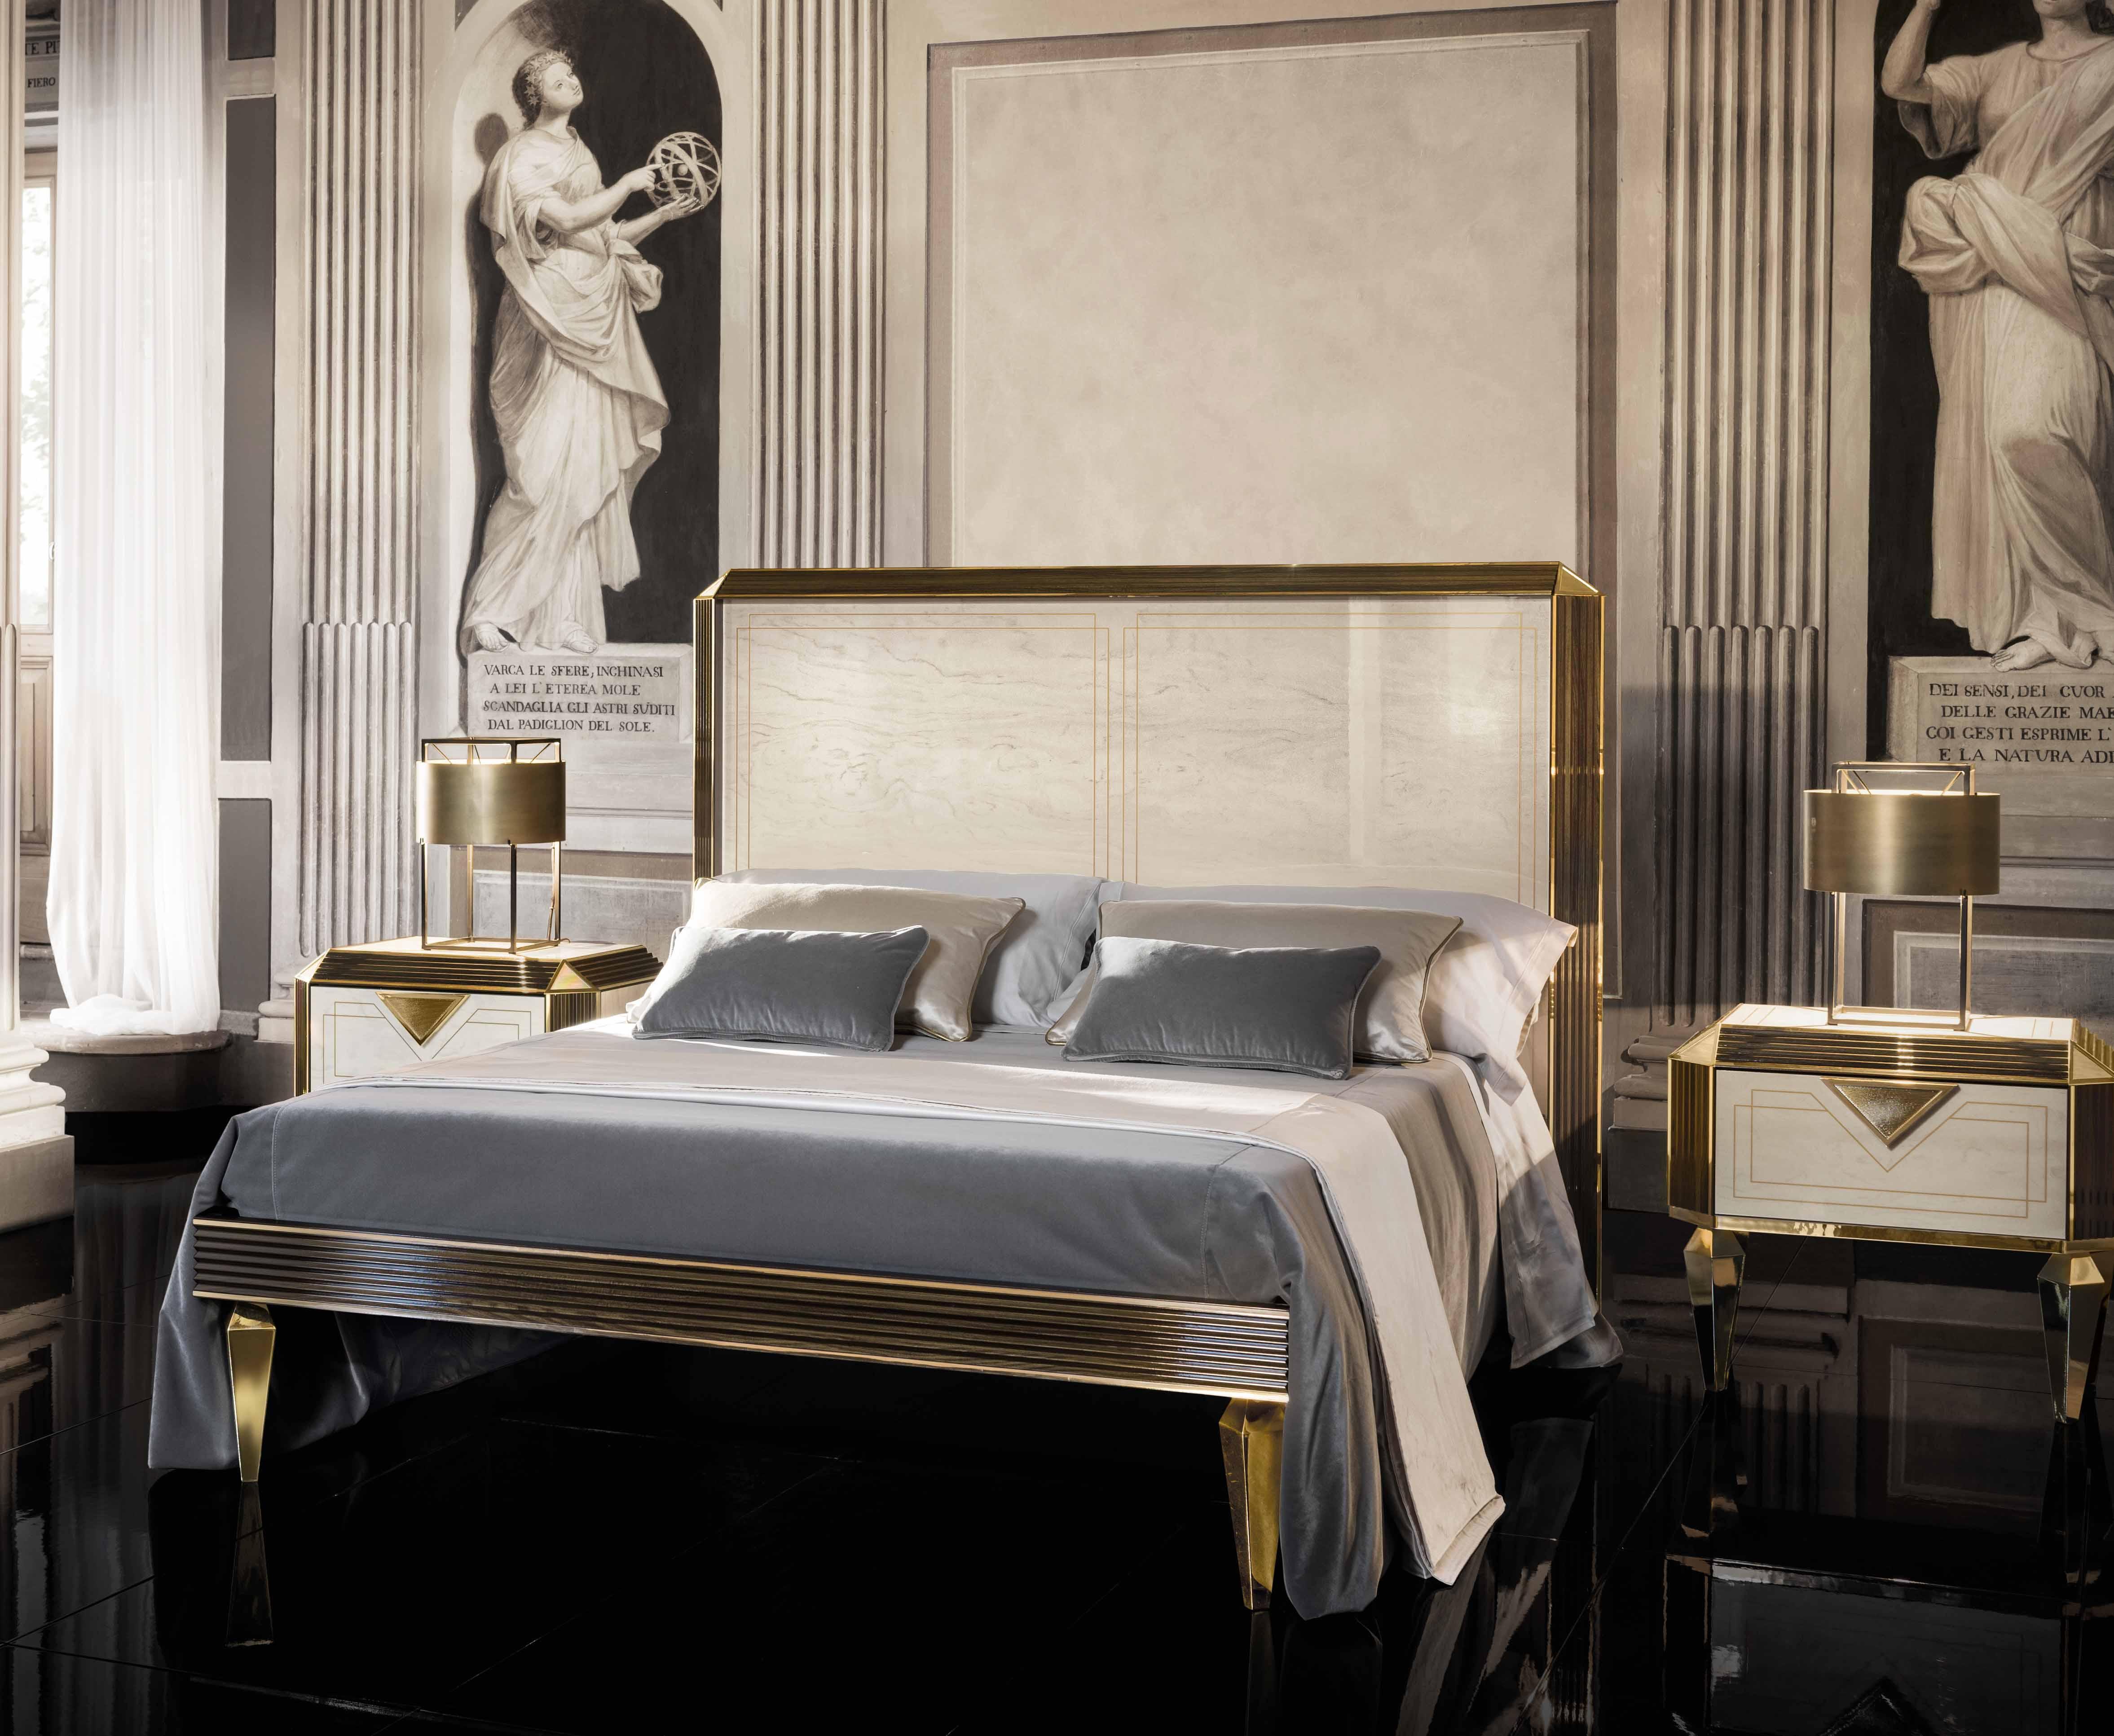 Bedombouw 180 200.Diamante Bed King Size Cm 180 200 X 200 Milano Italian Furniture